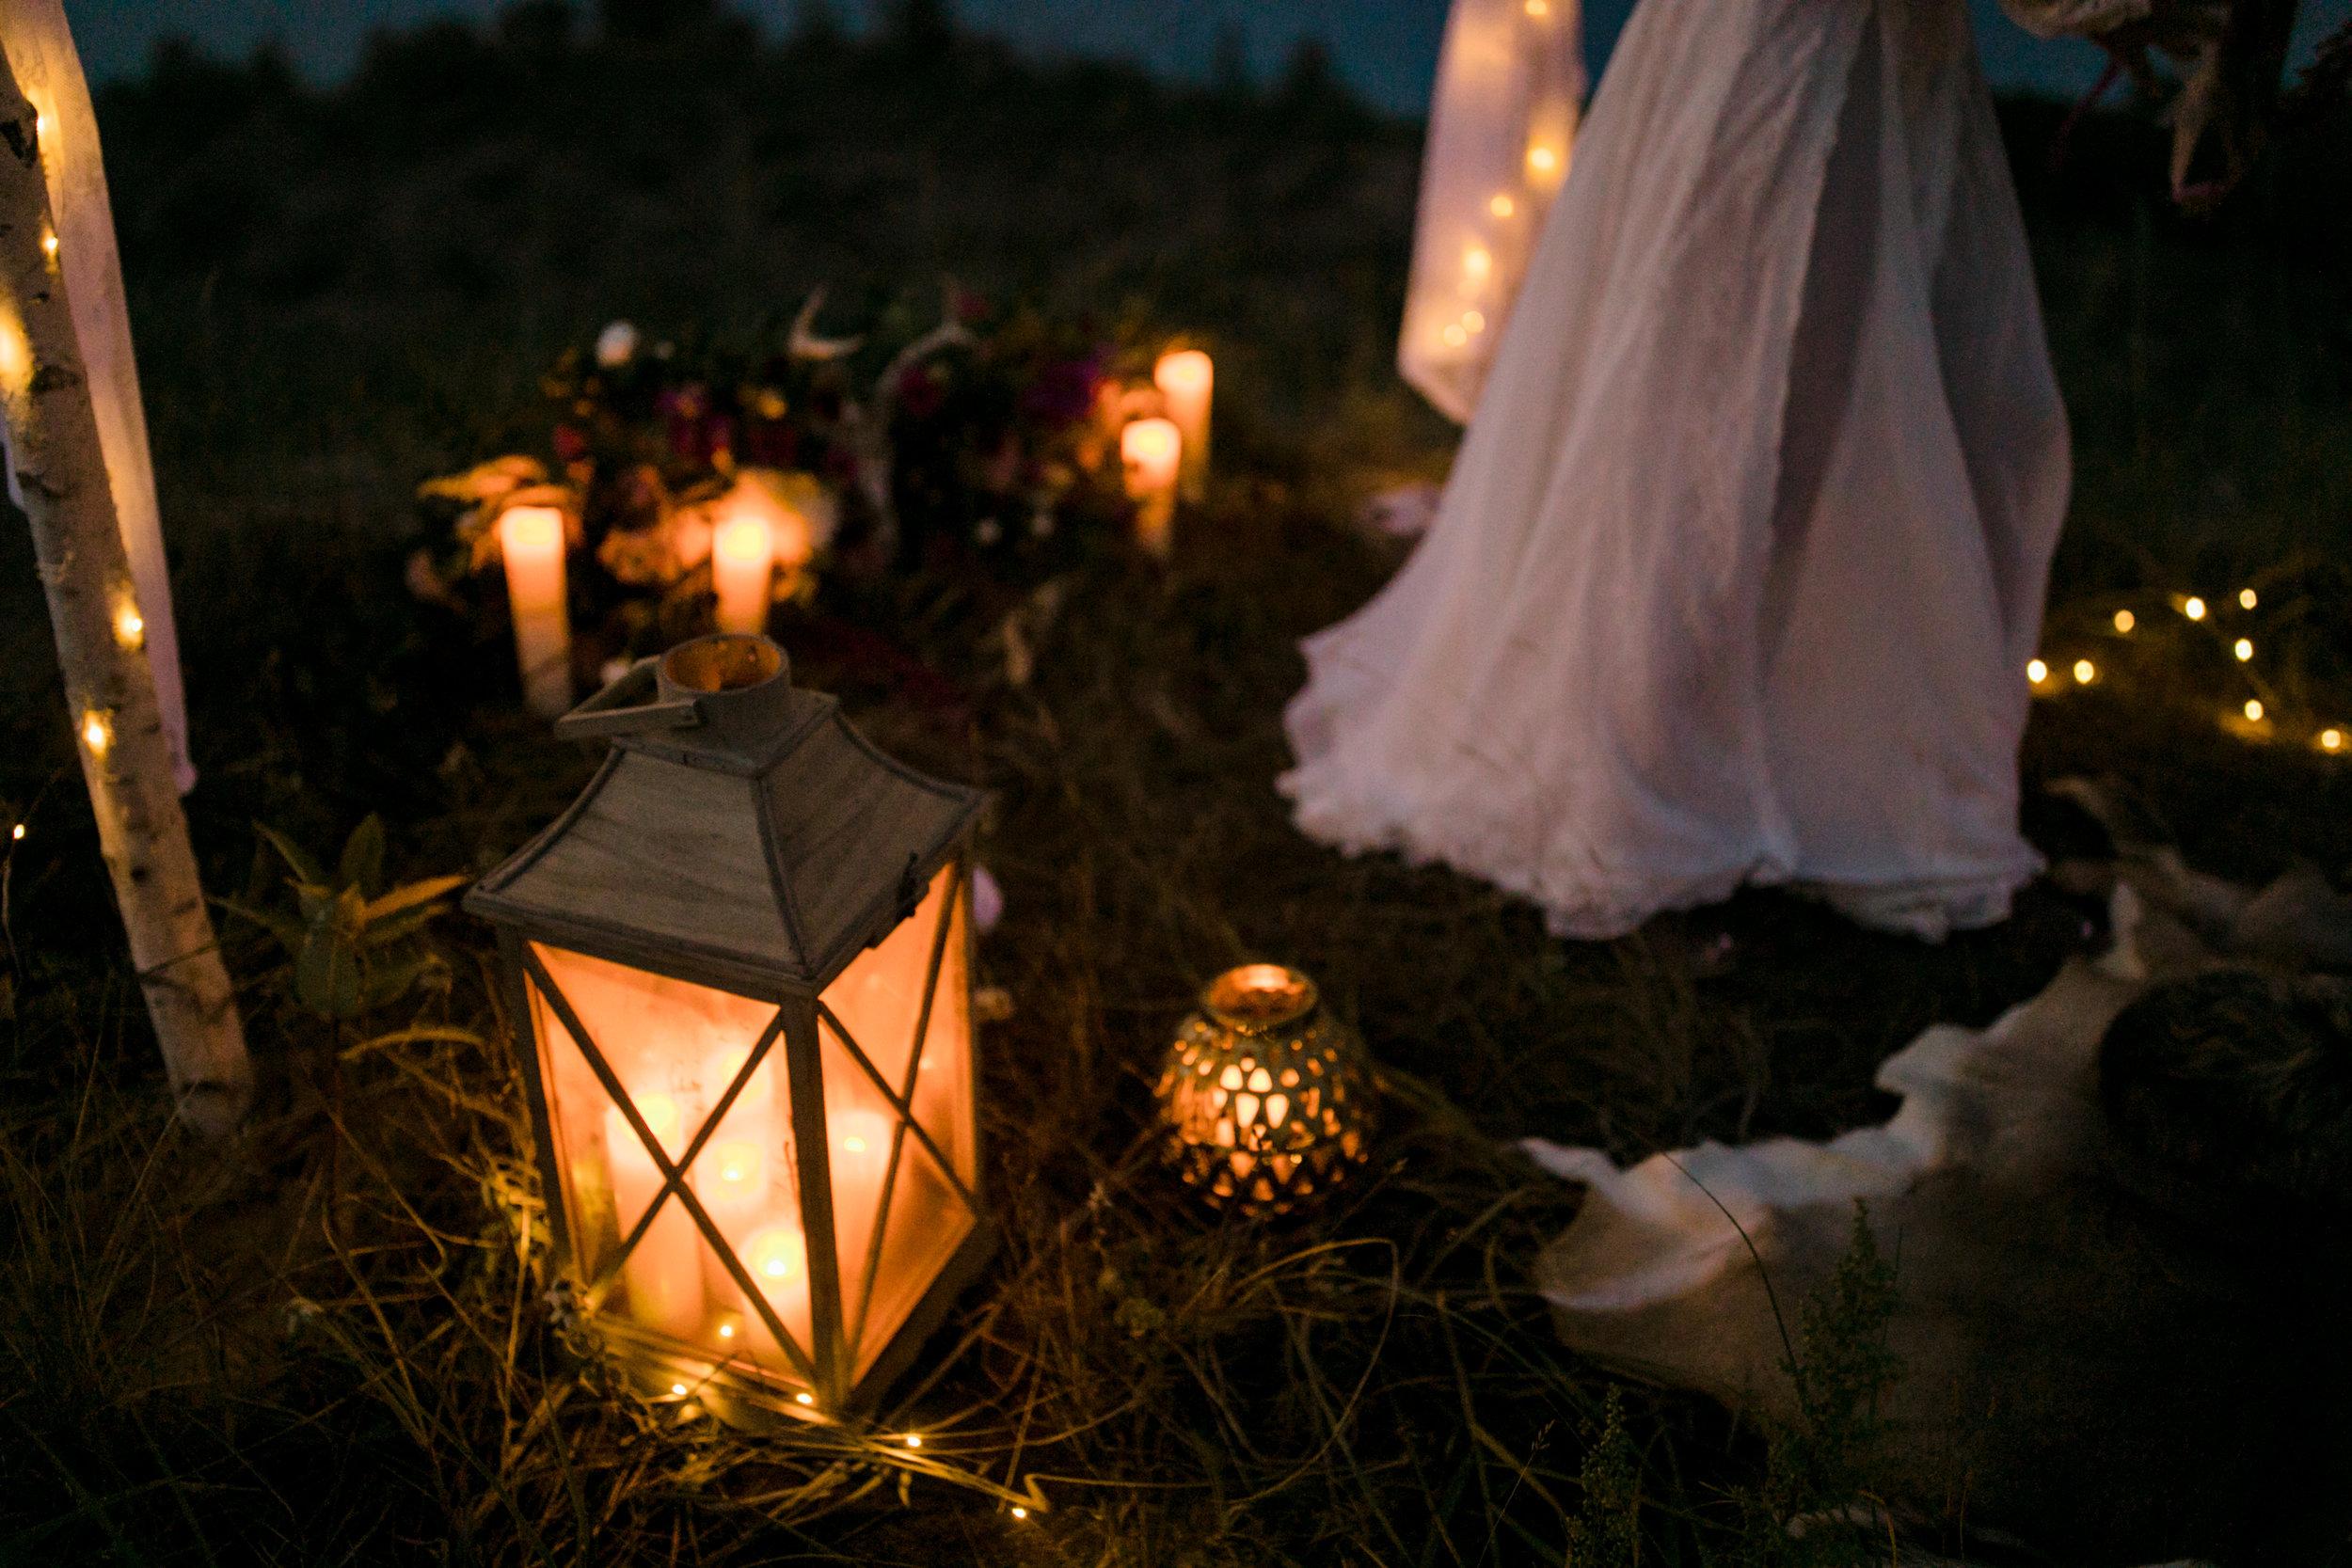 michigan-emotive-photographer-moonlight-elopement-mariha-hunter-247.jpg